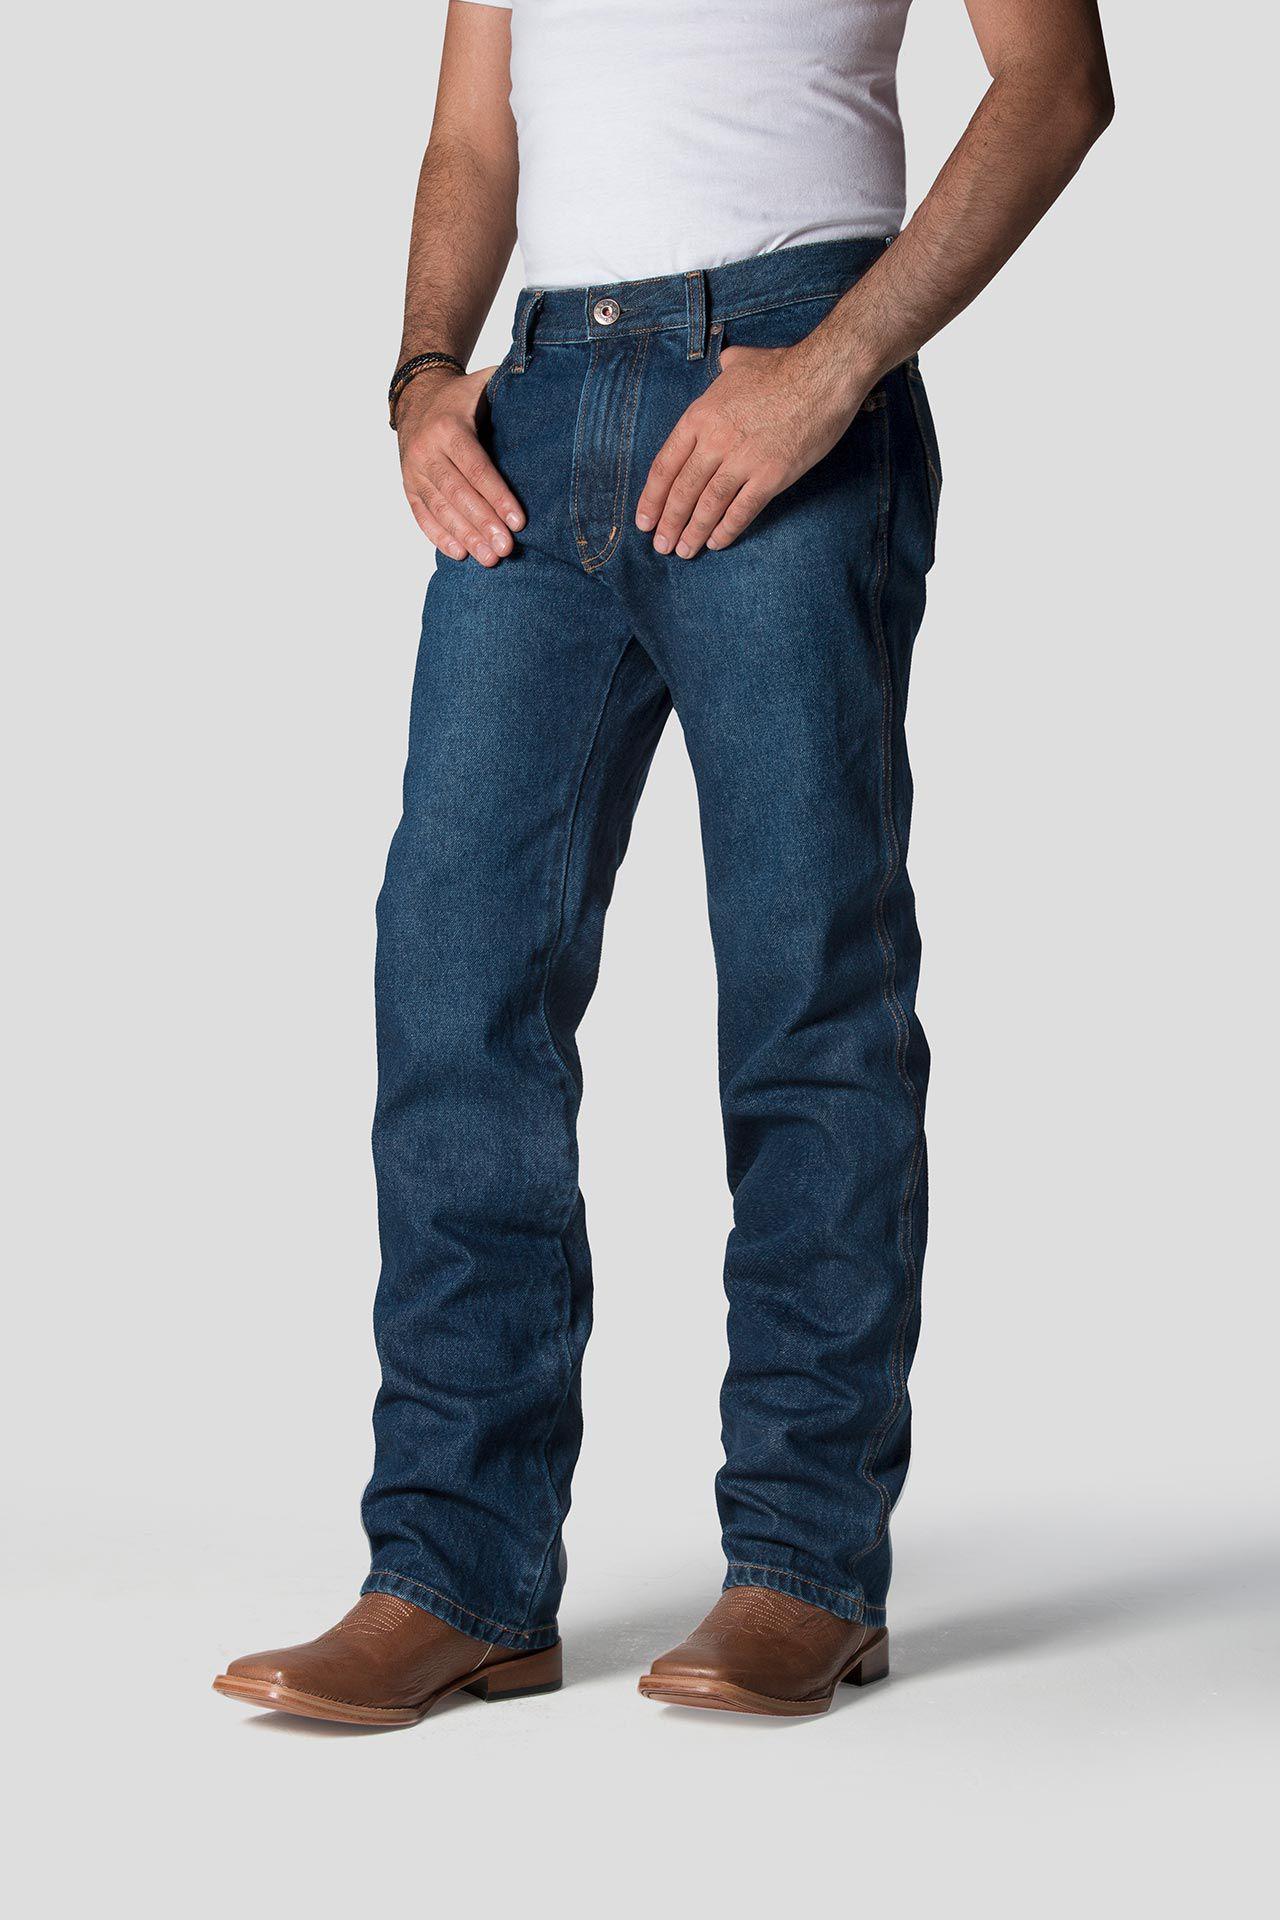 Calça Jeans TXC Masculina X2 BLACK